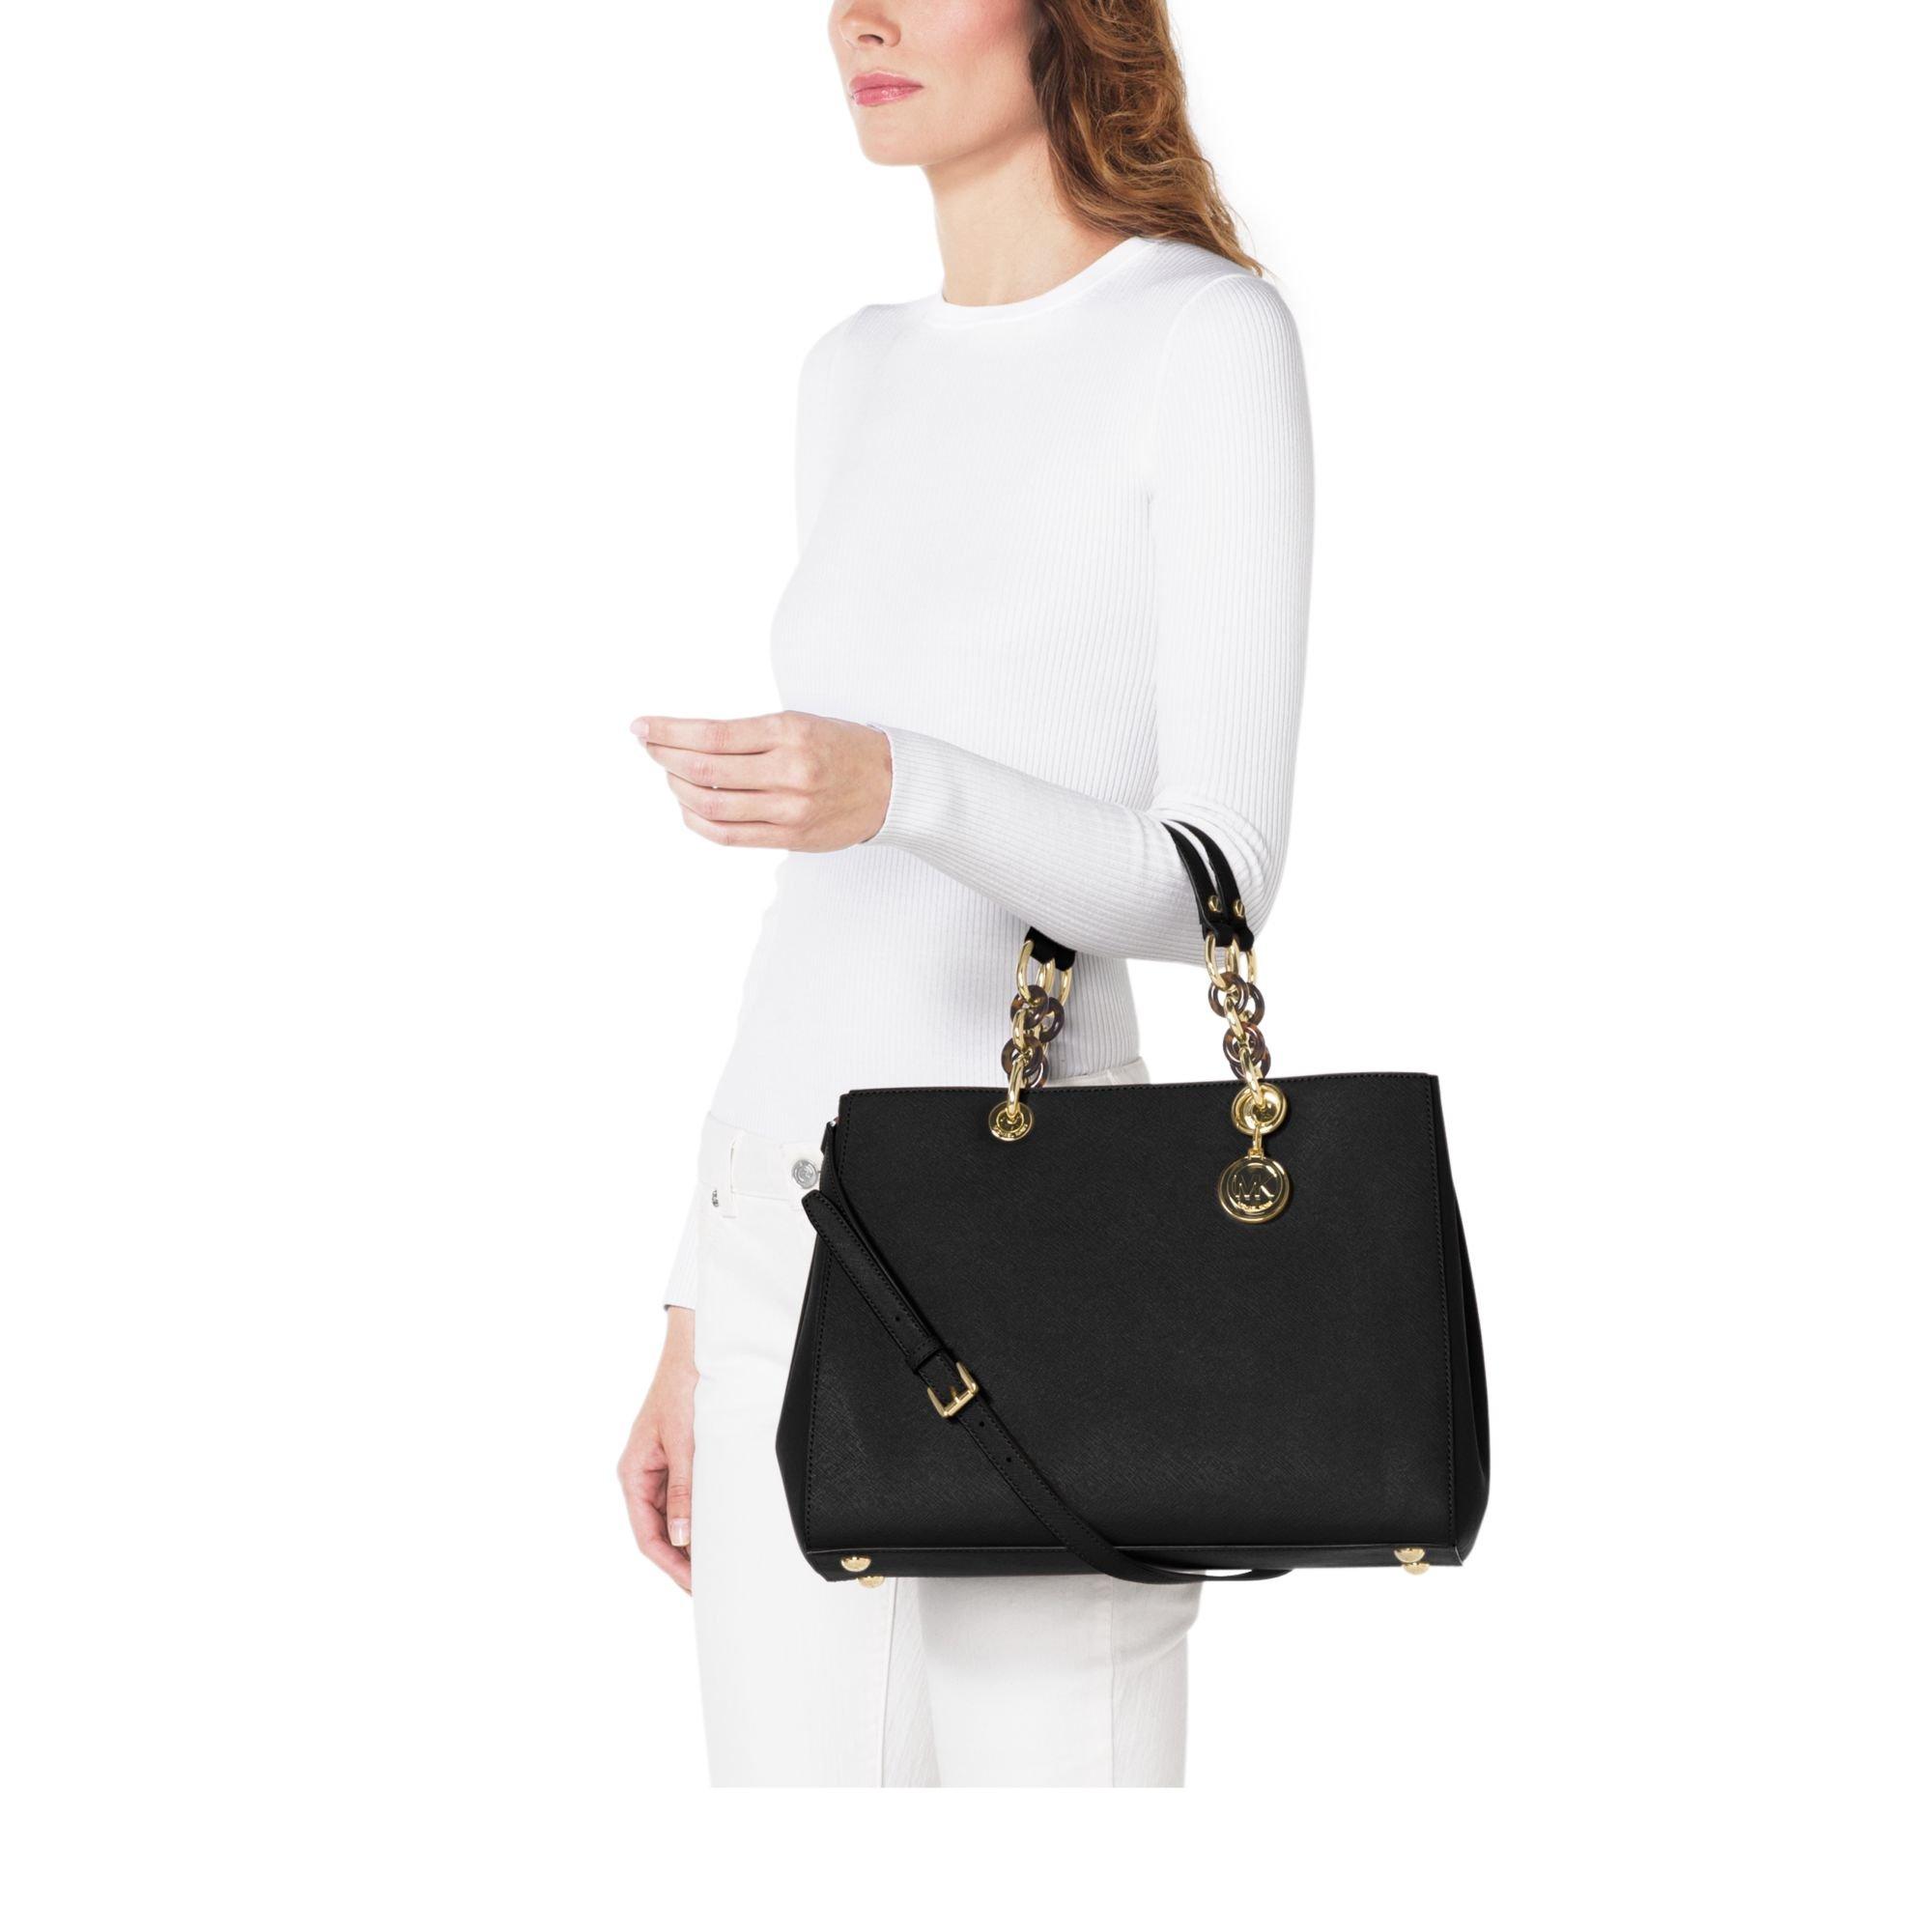 7dc3a1a1b9 Michael Kors Handbags Online Shopping - Foto Handbag All Collections ...